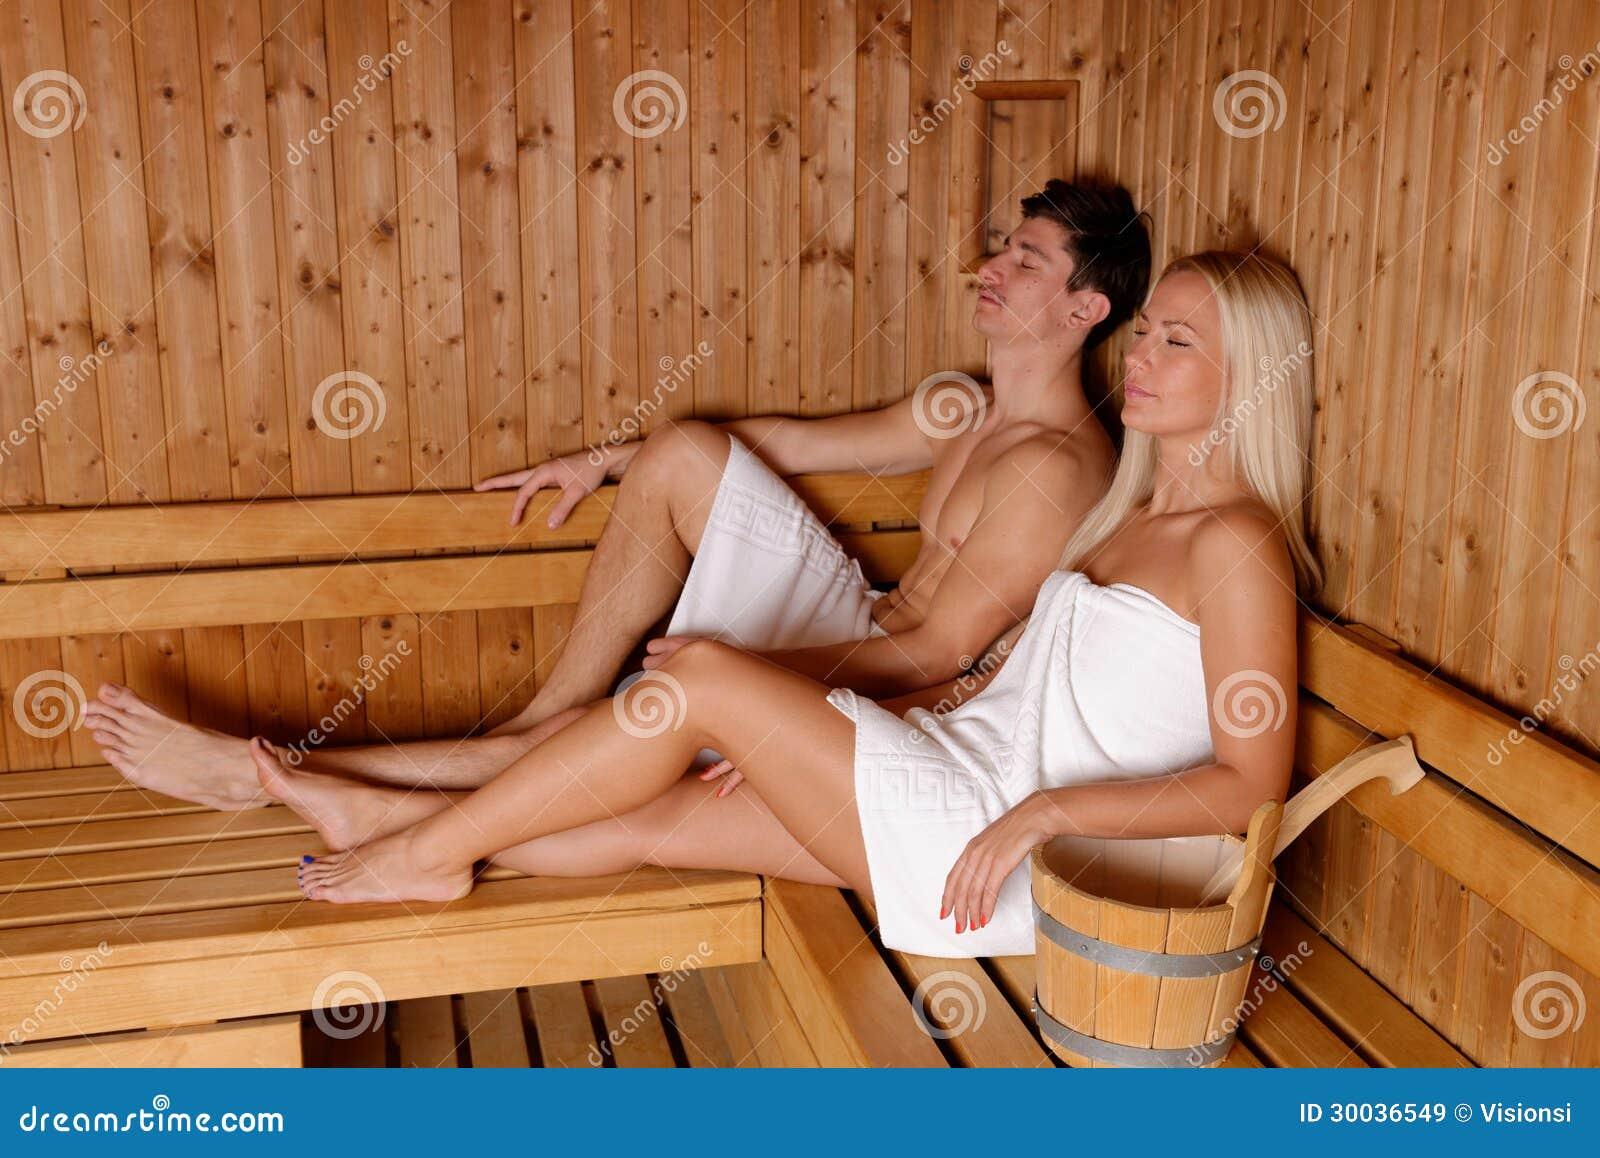 bdsm tipps paar sauna